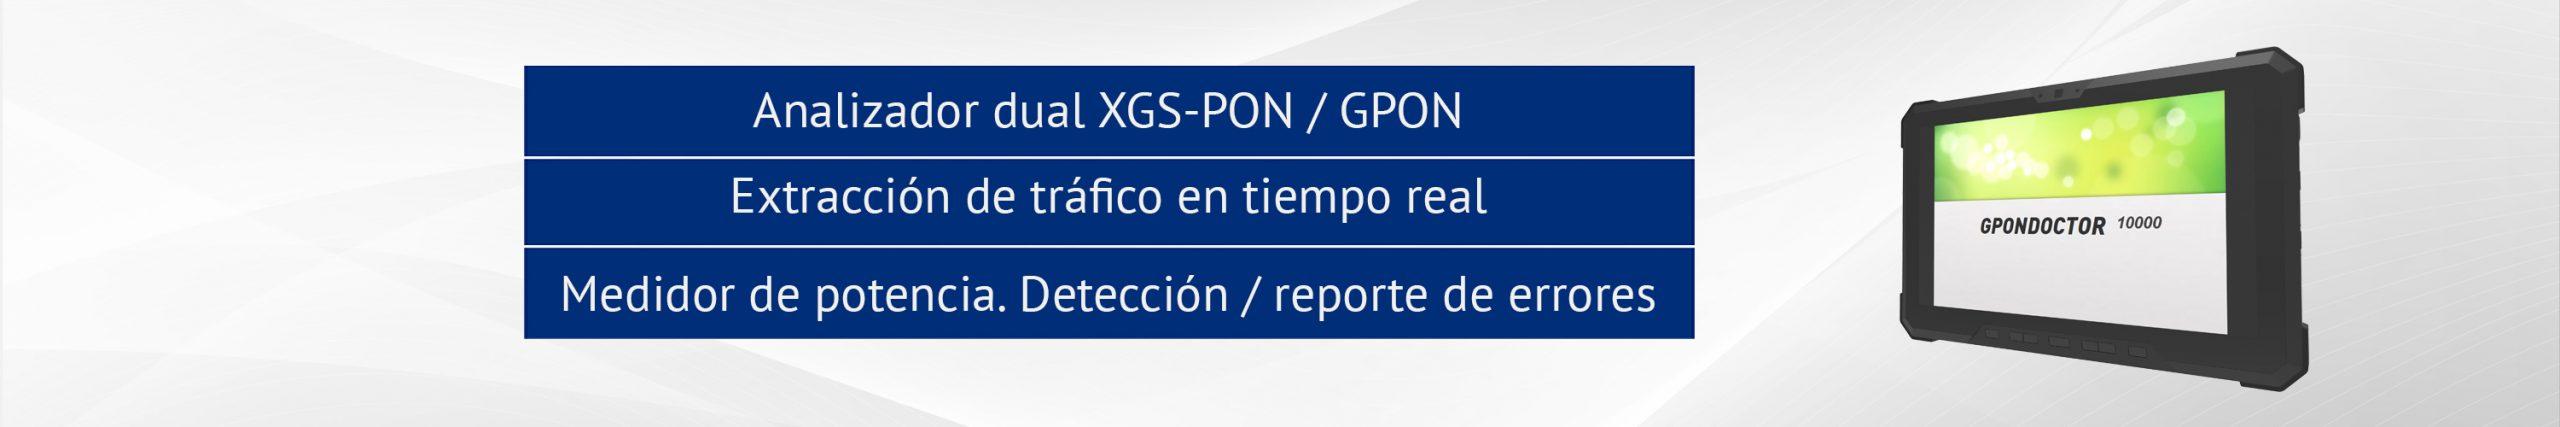 Analizador XGS-PON GPON Doctor 10000